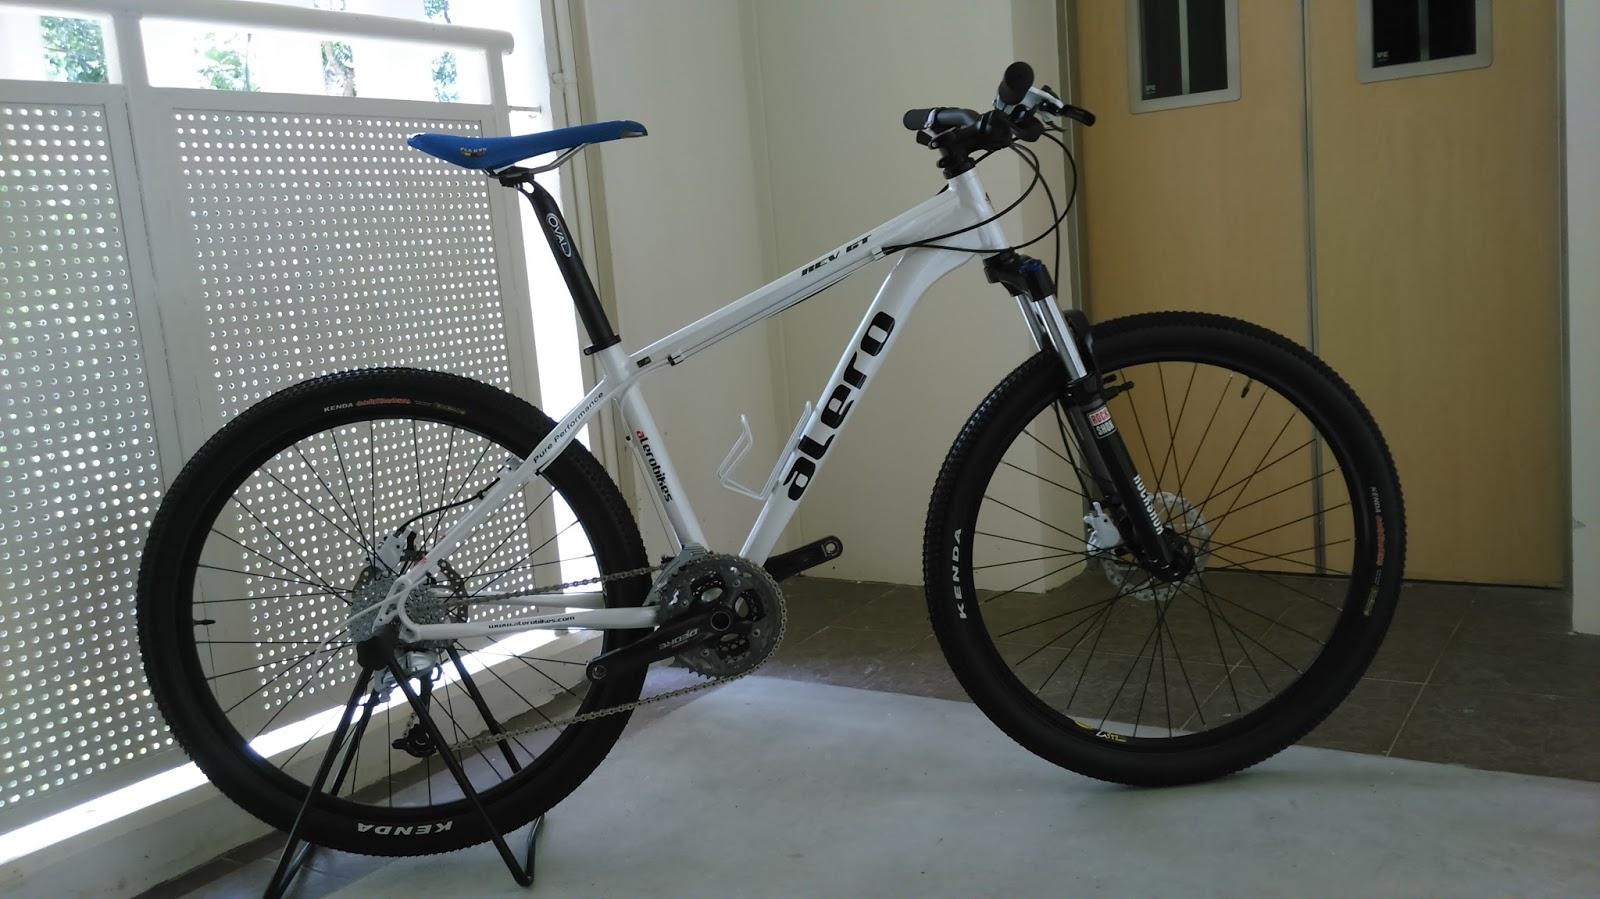 raleigh evo 7 folding bike instructions